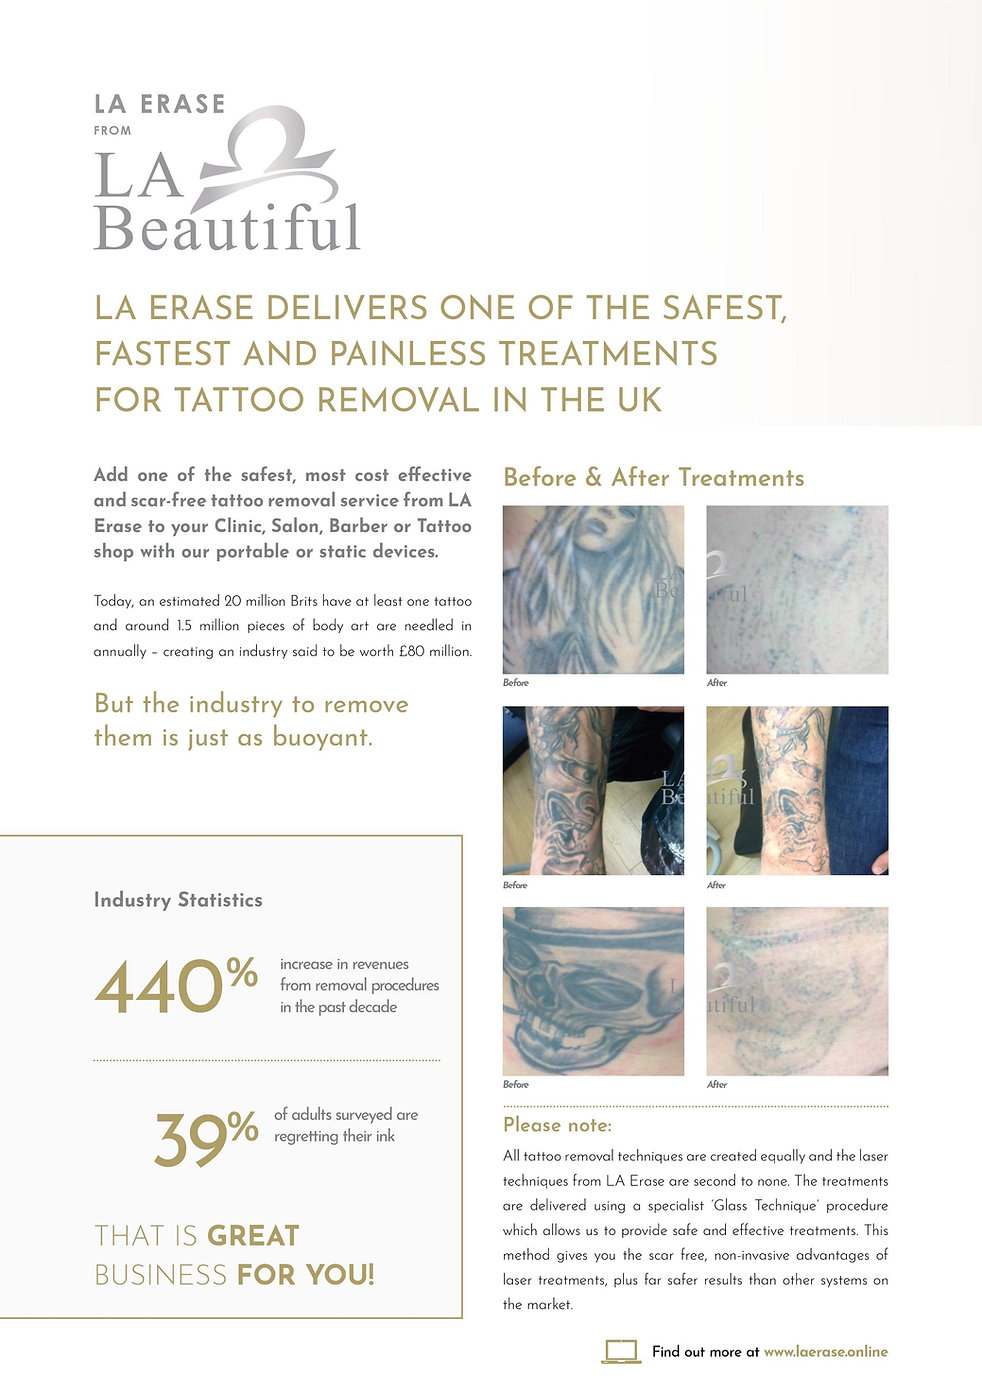 LA Erase Tattoo Removal.jpg